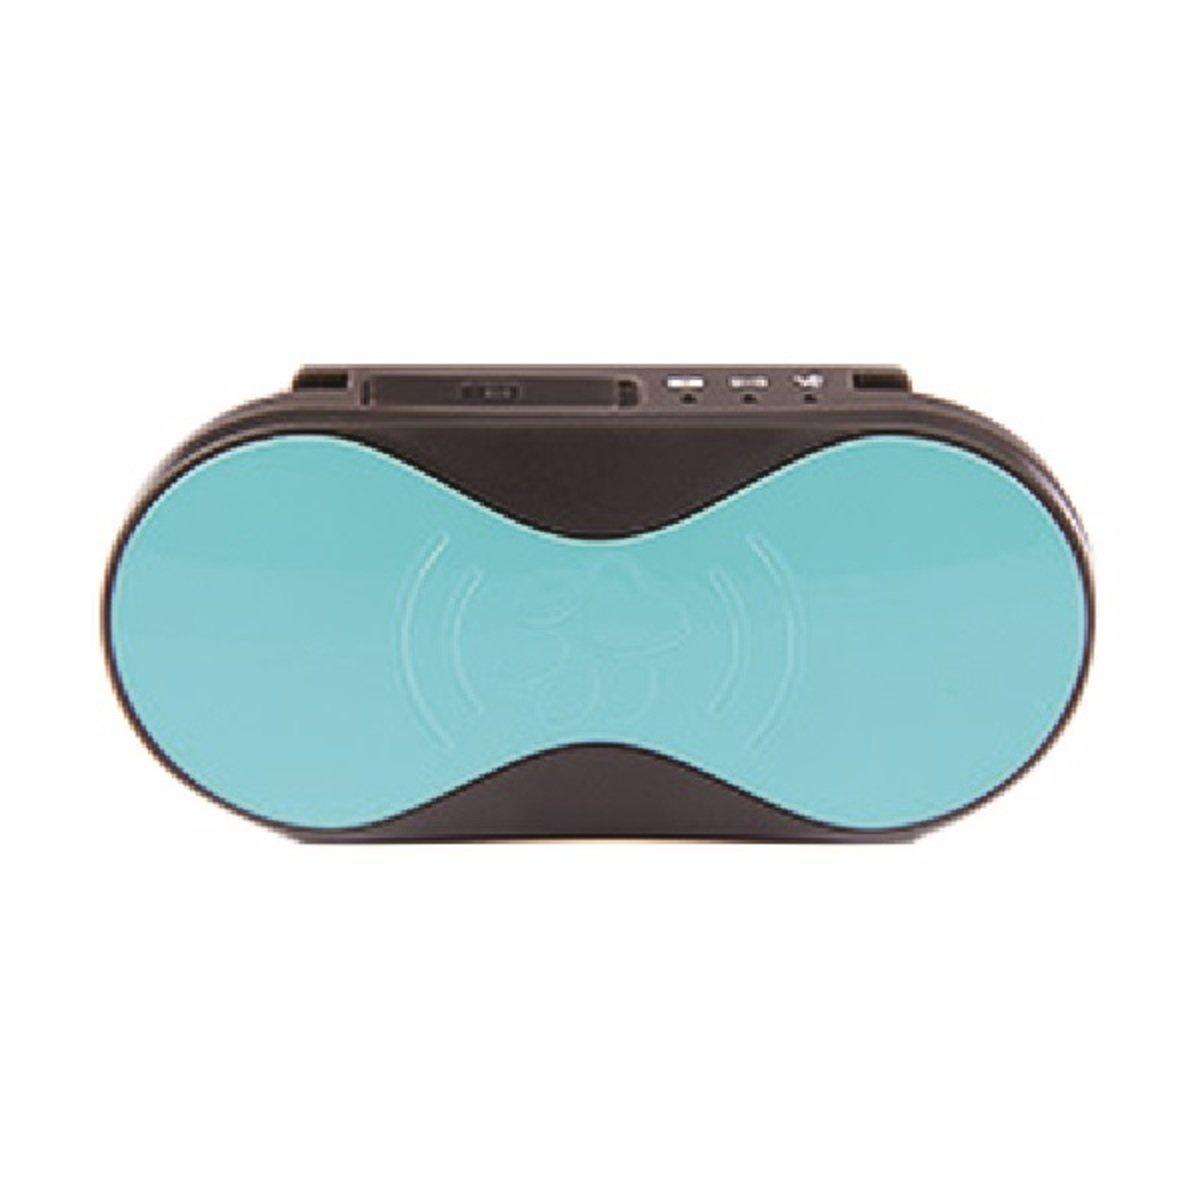 Lite Guardian®航通守護者-寵物追蹤器-藍色